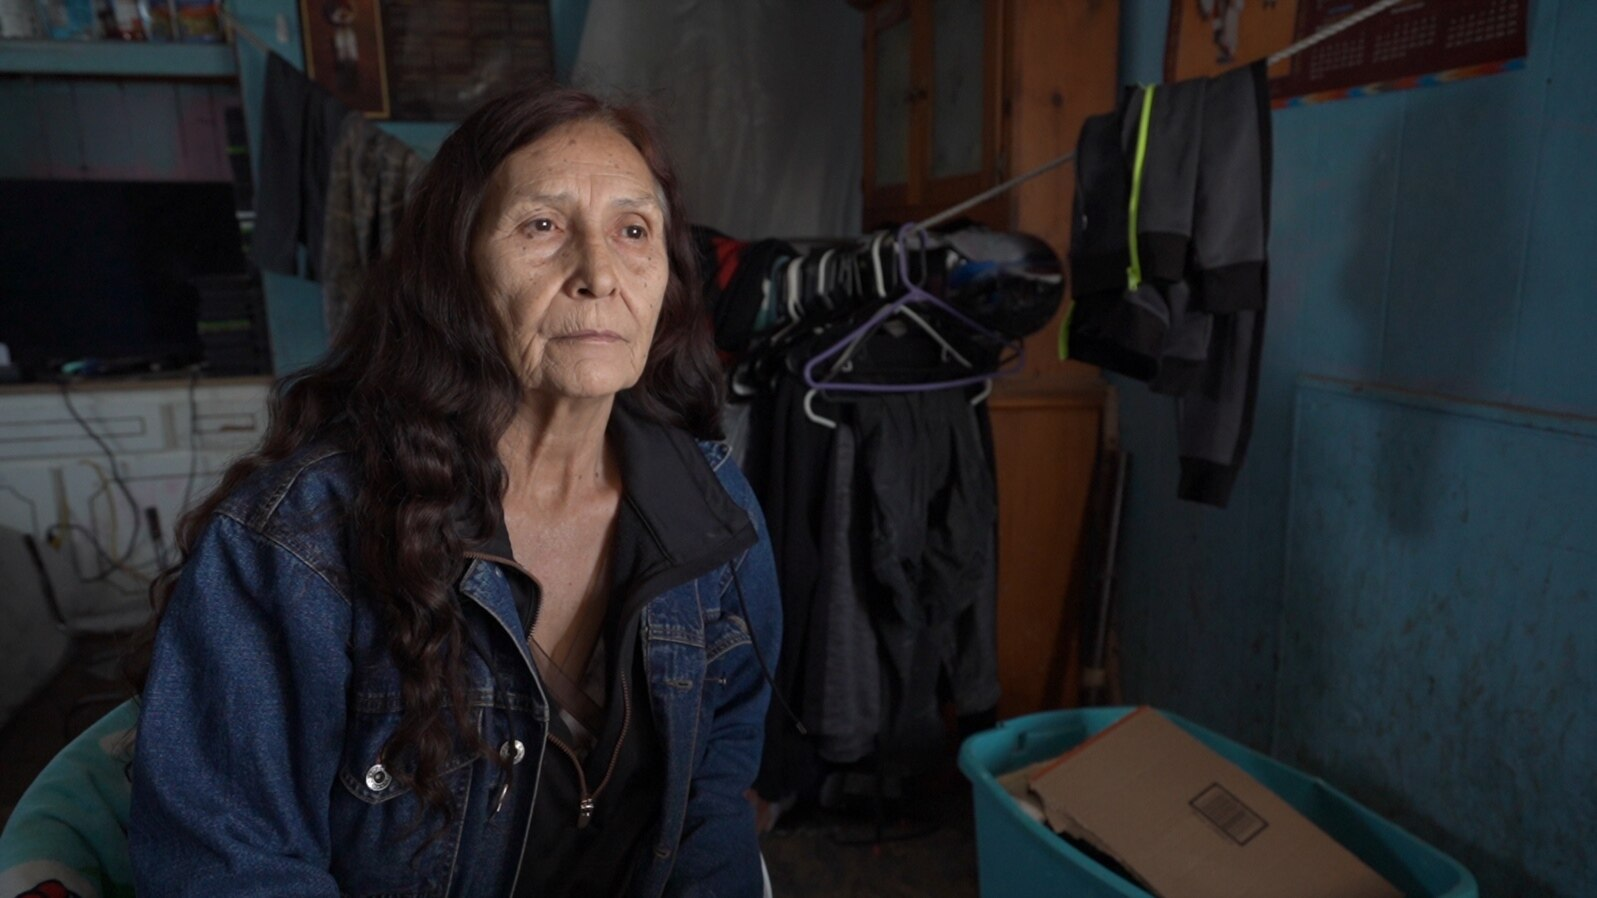 Voice of America film wins Audience Choice Award for Best Documentary Short at Kansas City FilmFest International 2021